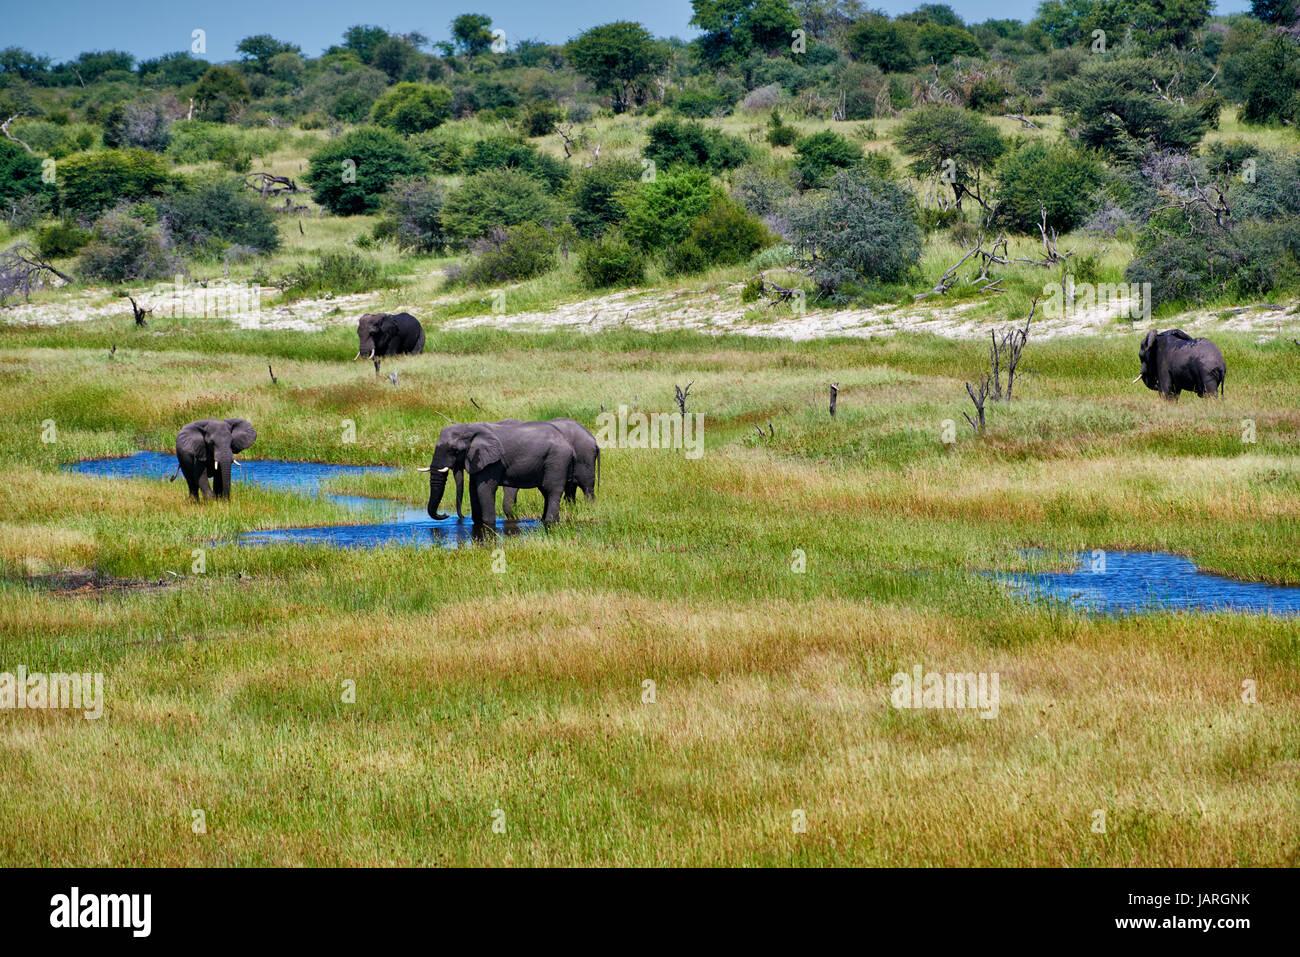 Manada de elefantes, bush africano Río Boteti, Makgadikgadi-Pans-National Park, Botswana, África Imagen De Stock